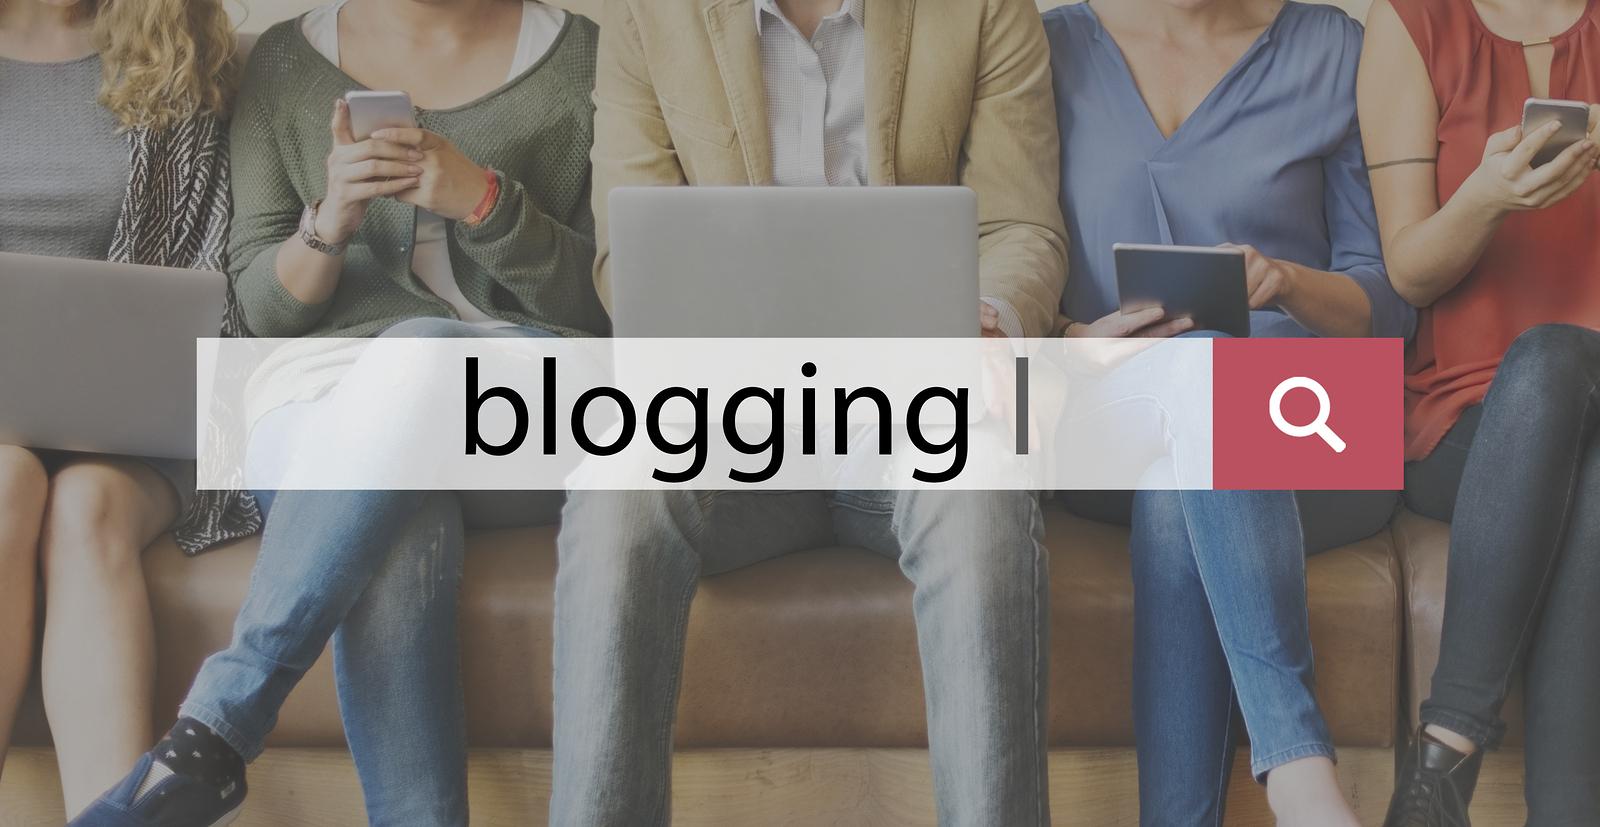 bigstock-Blog-Blogging-Blogger-Communic-125801912.jpg